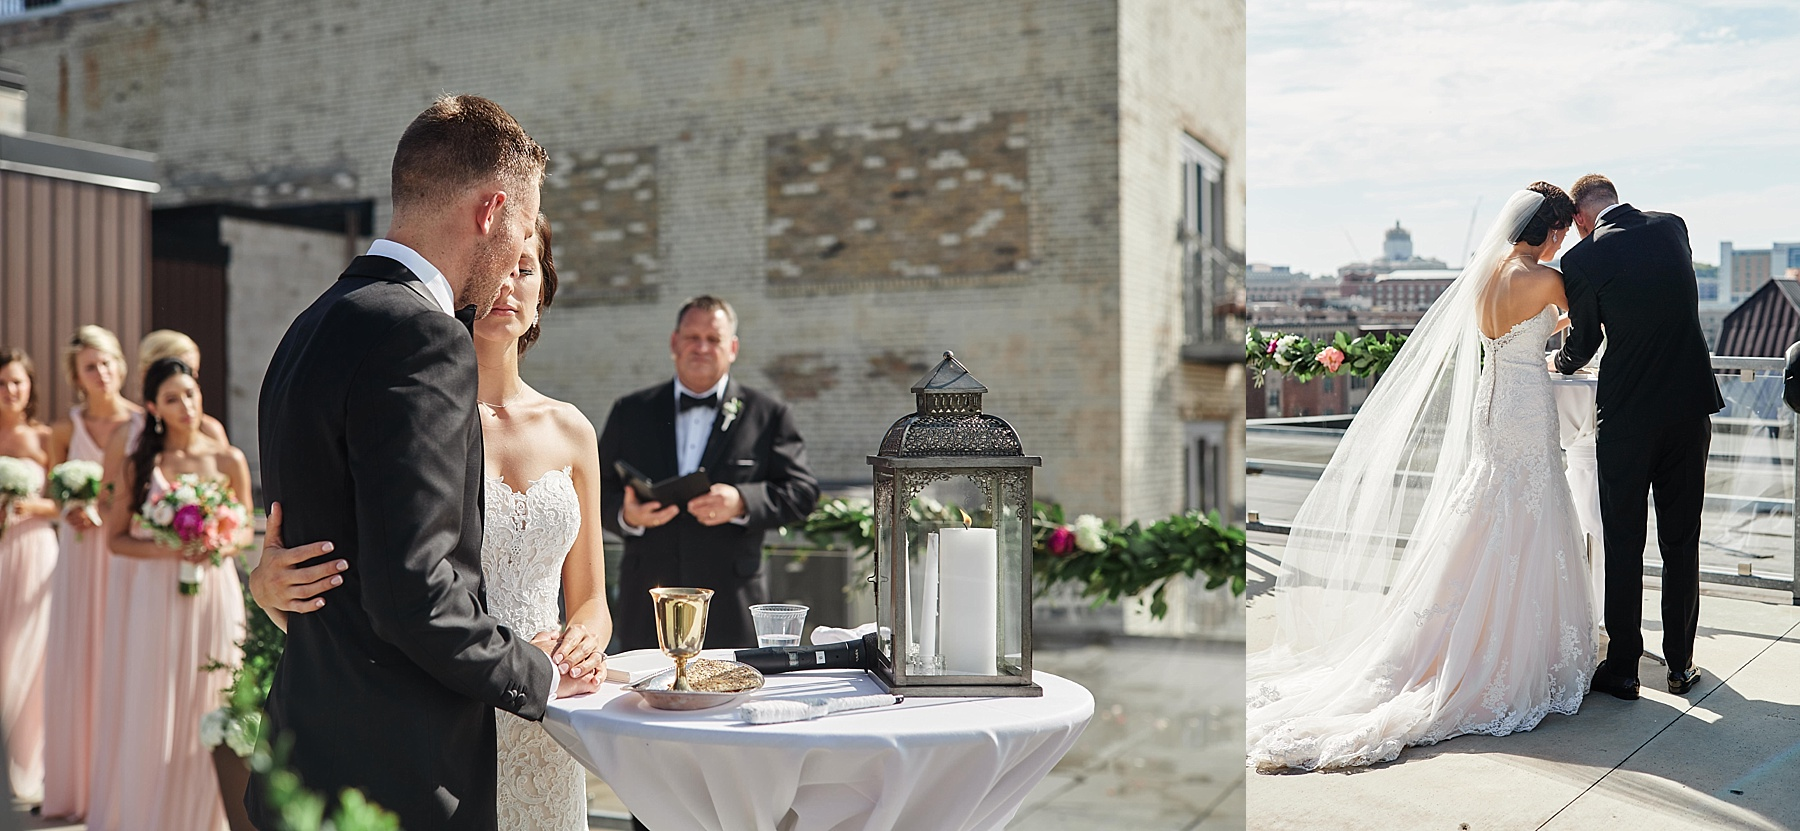 ABULAE-Wedding-Saint-paul-MN-Josh-Sofia-Wedding-Mears-Park_0769.jpg